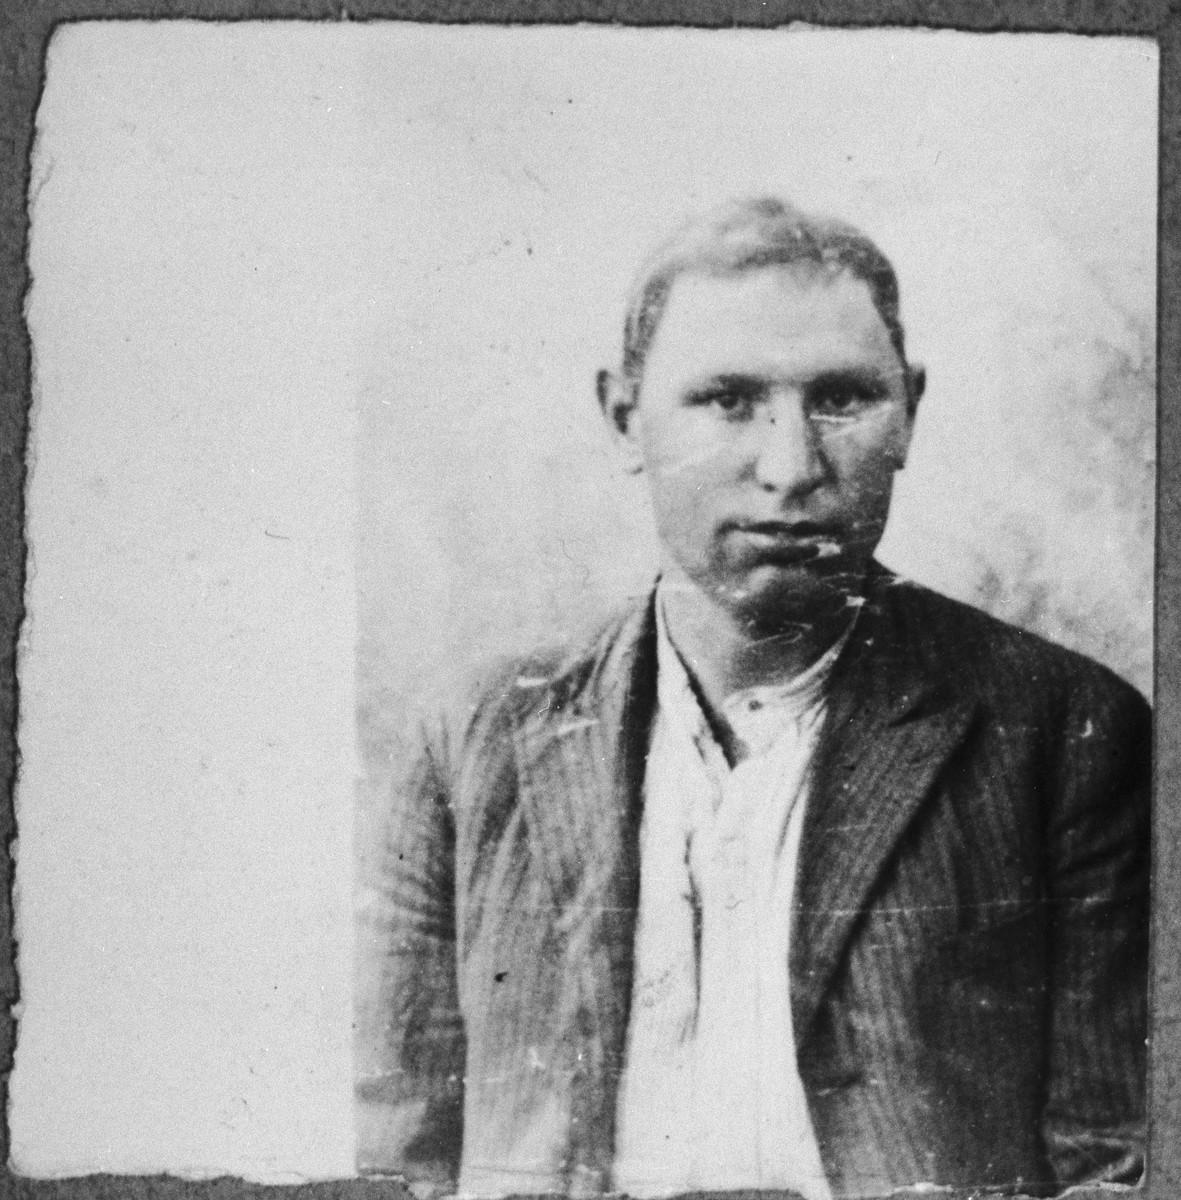 Portrait of Yakov Kamchi, son of Samuel Kamchi.  He lived at Krstitsa 16 in Bitola.